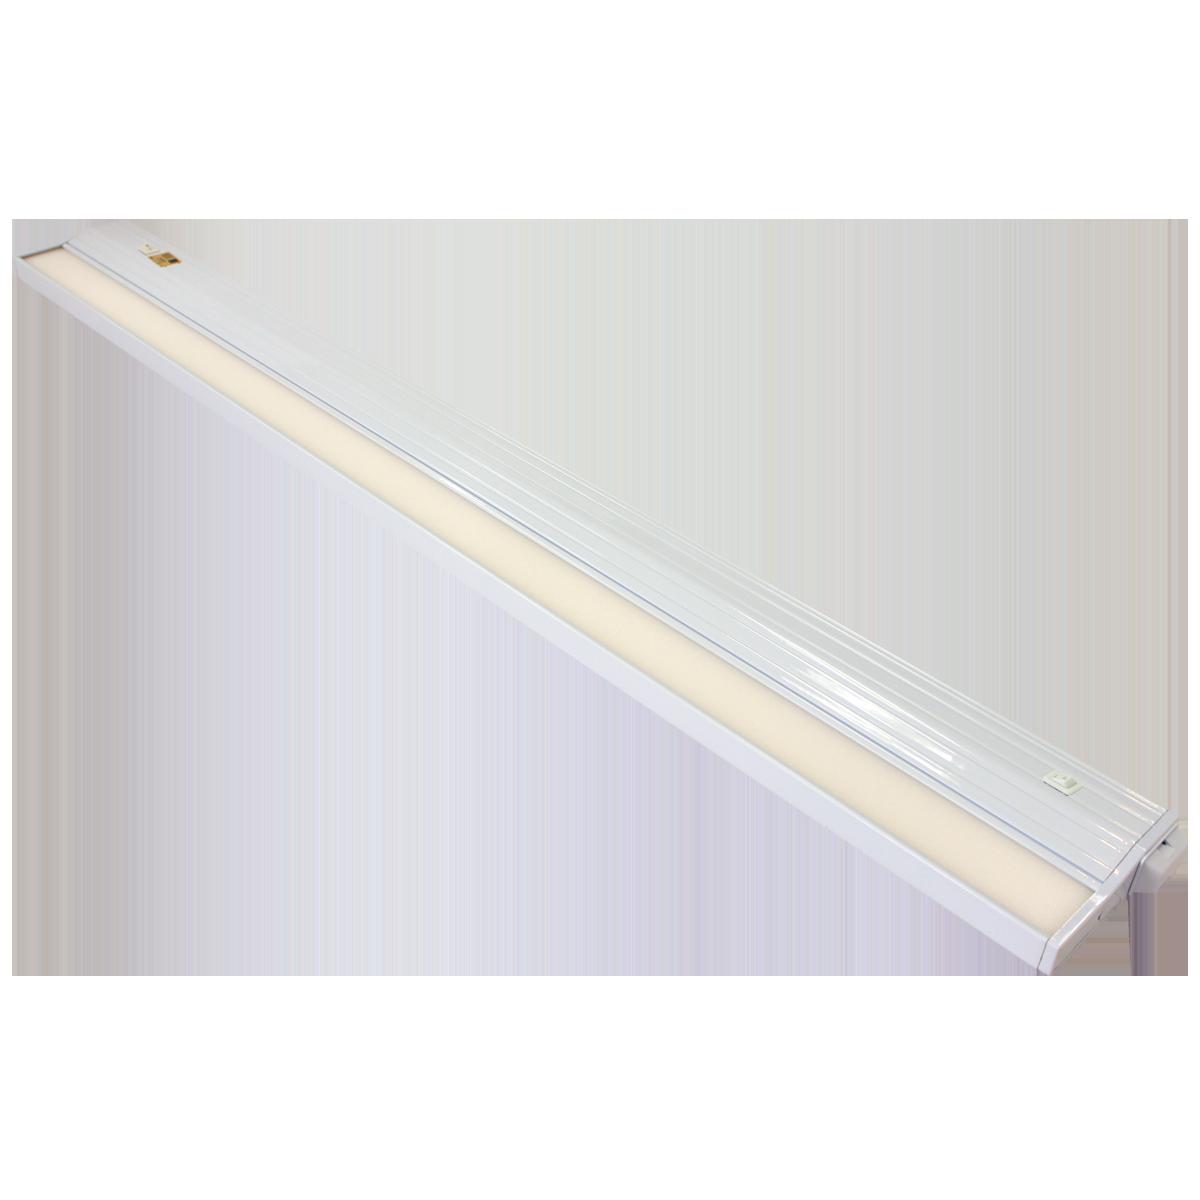 "32"" Eco-Counter LED Undercabinet, White Finish, Dual Switchable CCT"